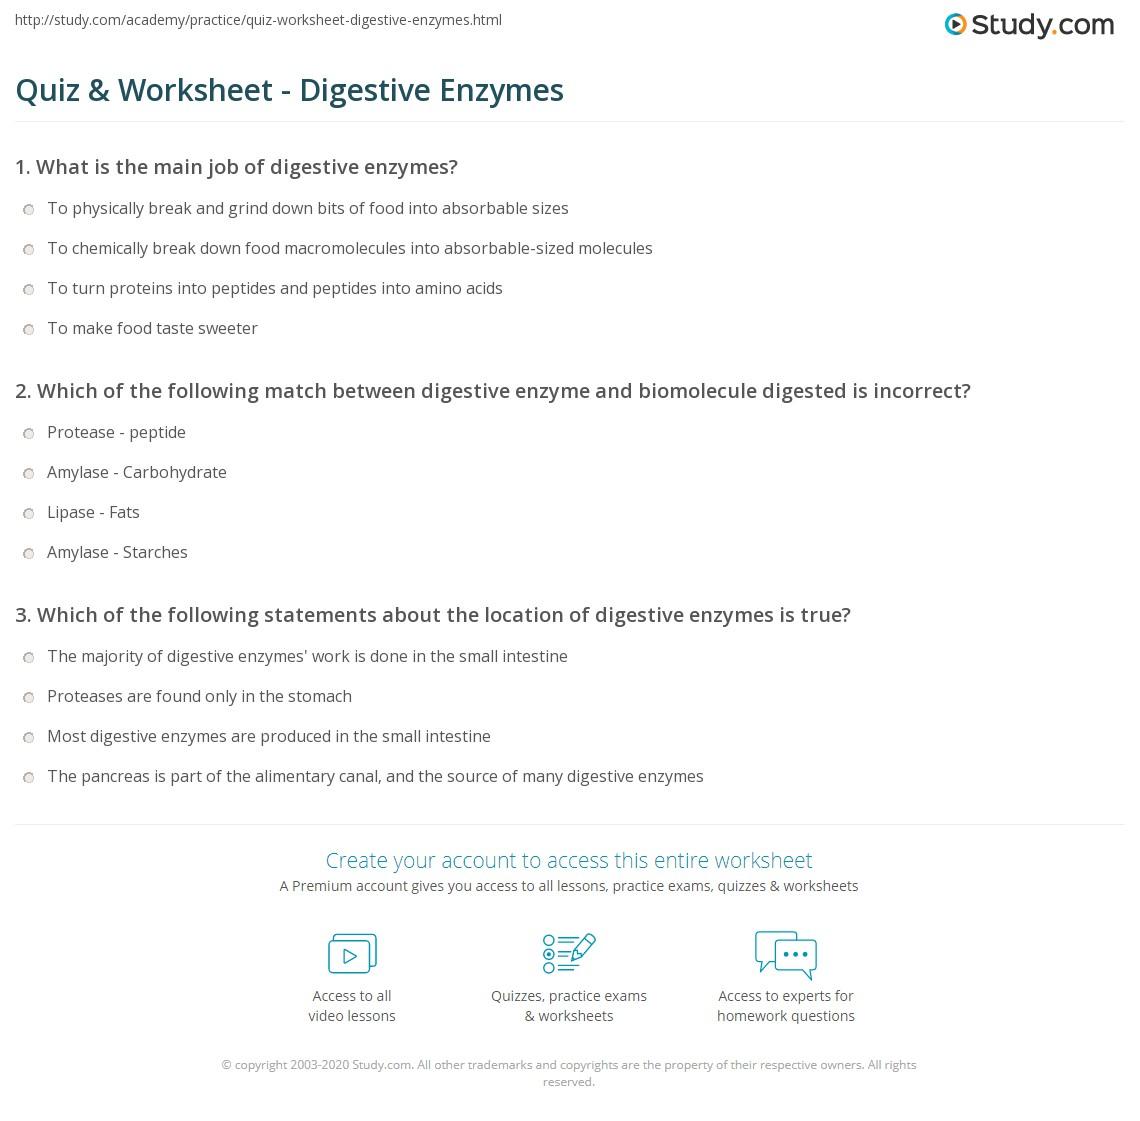 Quiz & Worksheet - Digestive Enzymes | Study.com